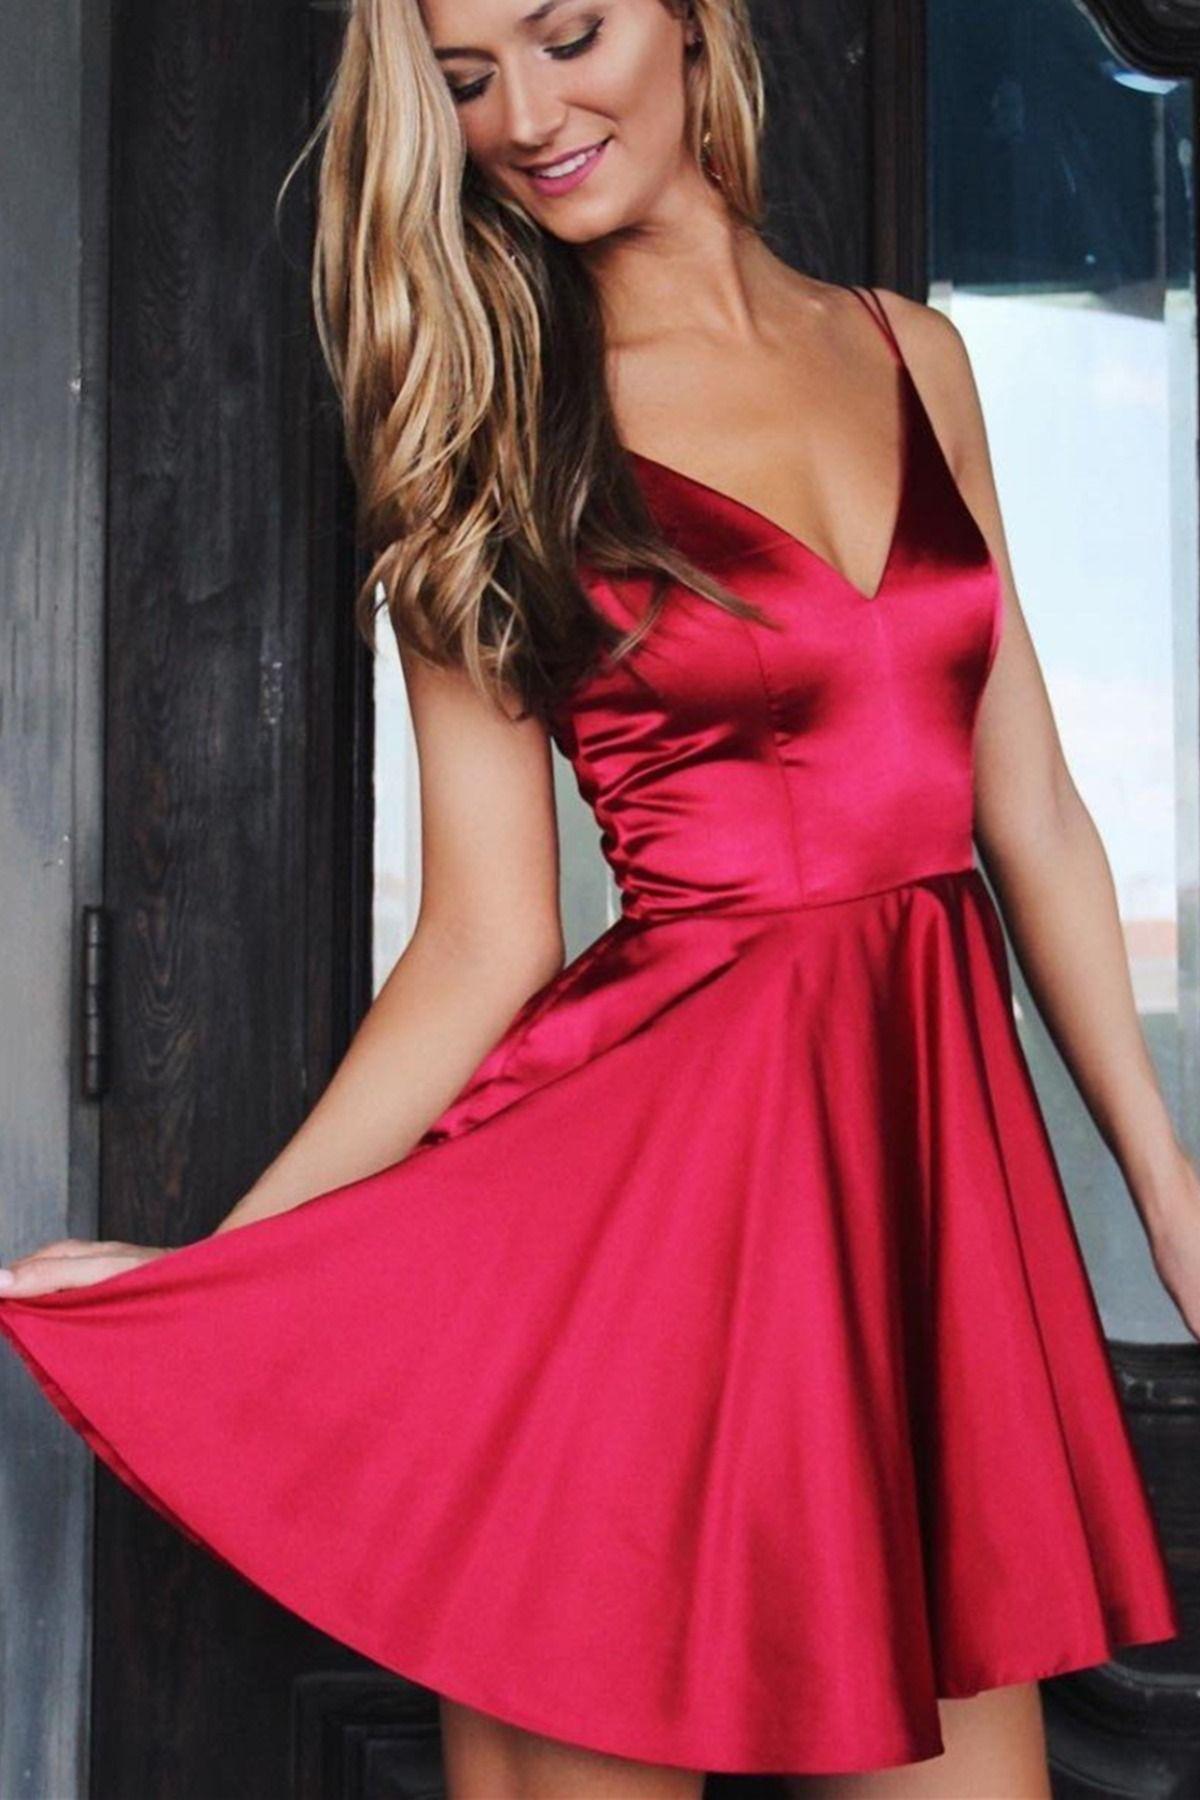 A Line V Neck Short Burgundy Prom Dresses Short Wine Red Formal Graduation Homecoming Dresses In 2021 Red Homecoming Dresses Red Dress Party Satin Homecoming Dress [ 1800 x 1200 Pixel ]